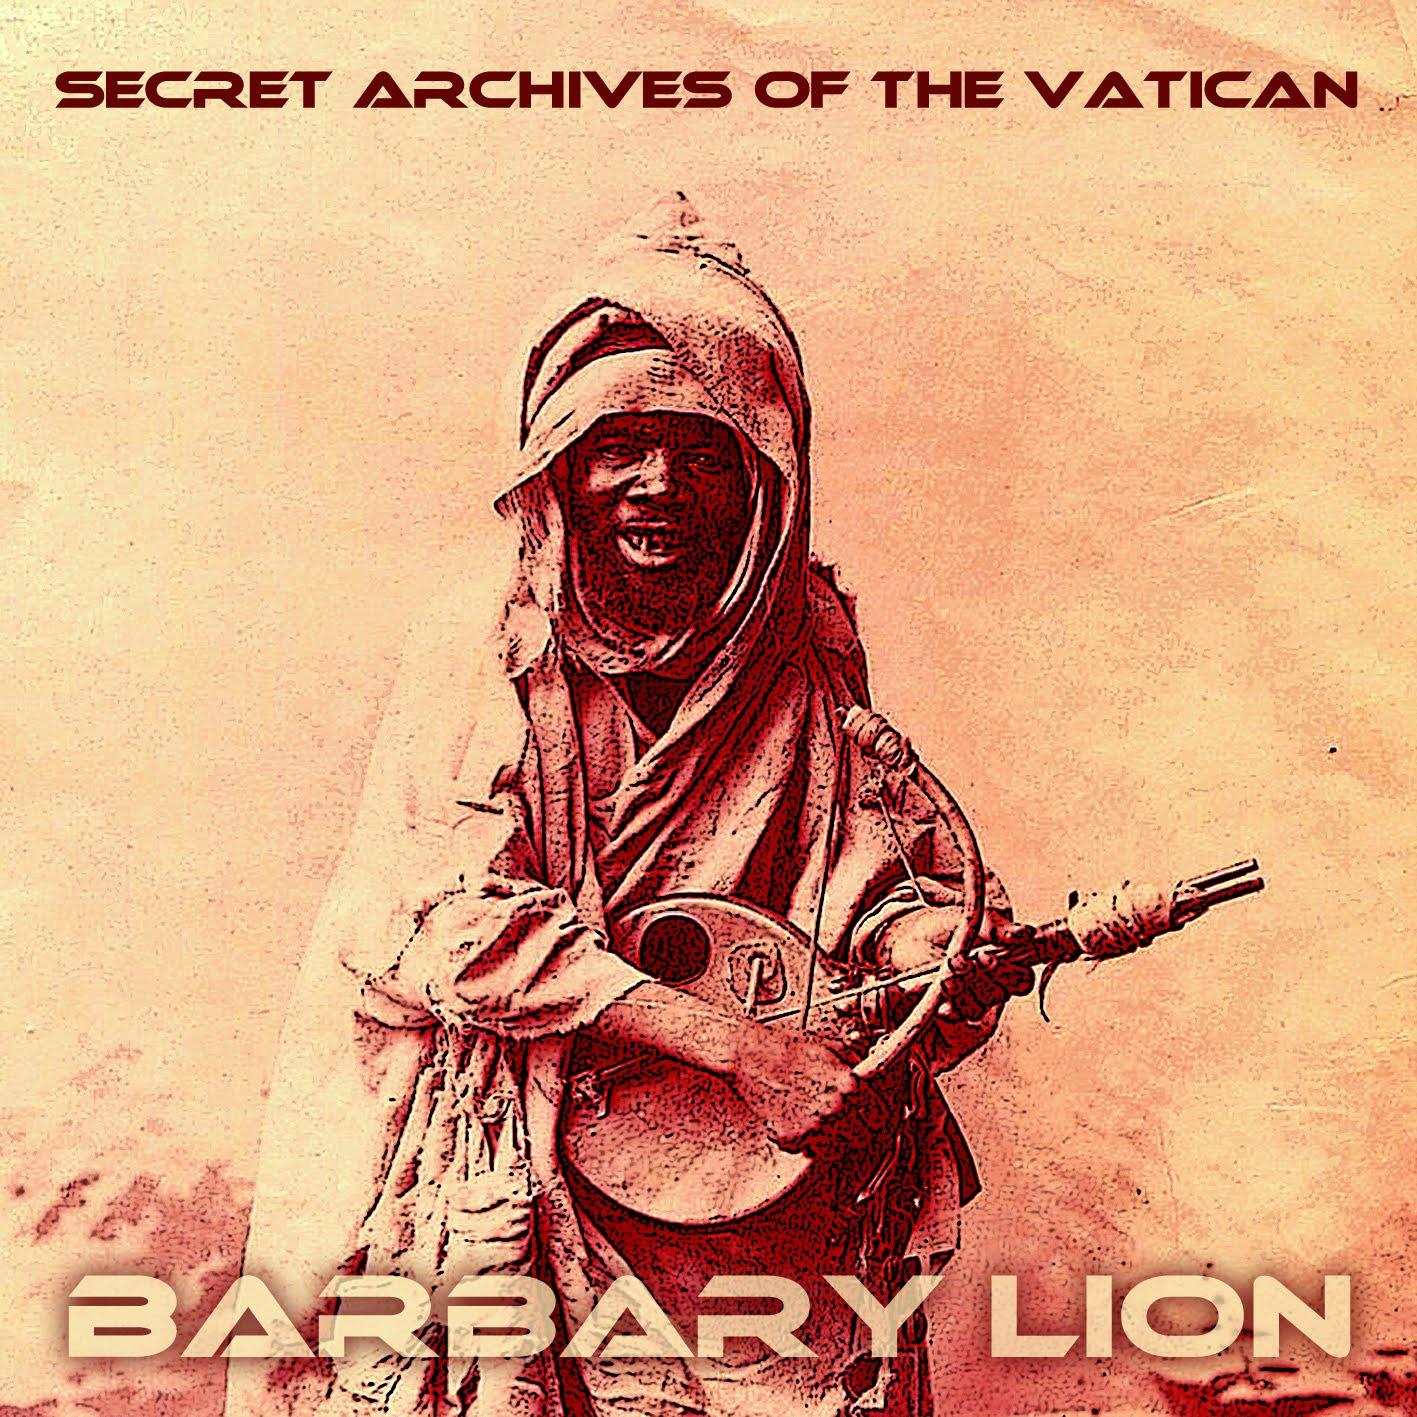 http://3.bp.blogspot.com/-m2xN7-Cqgw4/TiNAZFLxWBI/AAAAAAAAB3I/Z7_xINS5n3w/s1600/Secret%2BArchives%2Bof%2Bthe%2BVatican%2B-%2BBarbary%2BLion%2B-%2BBarbary%2BLion%2BCover%2BFront.jpg